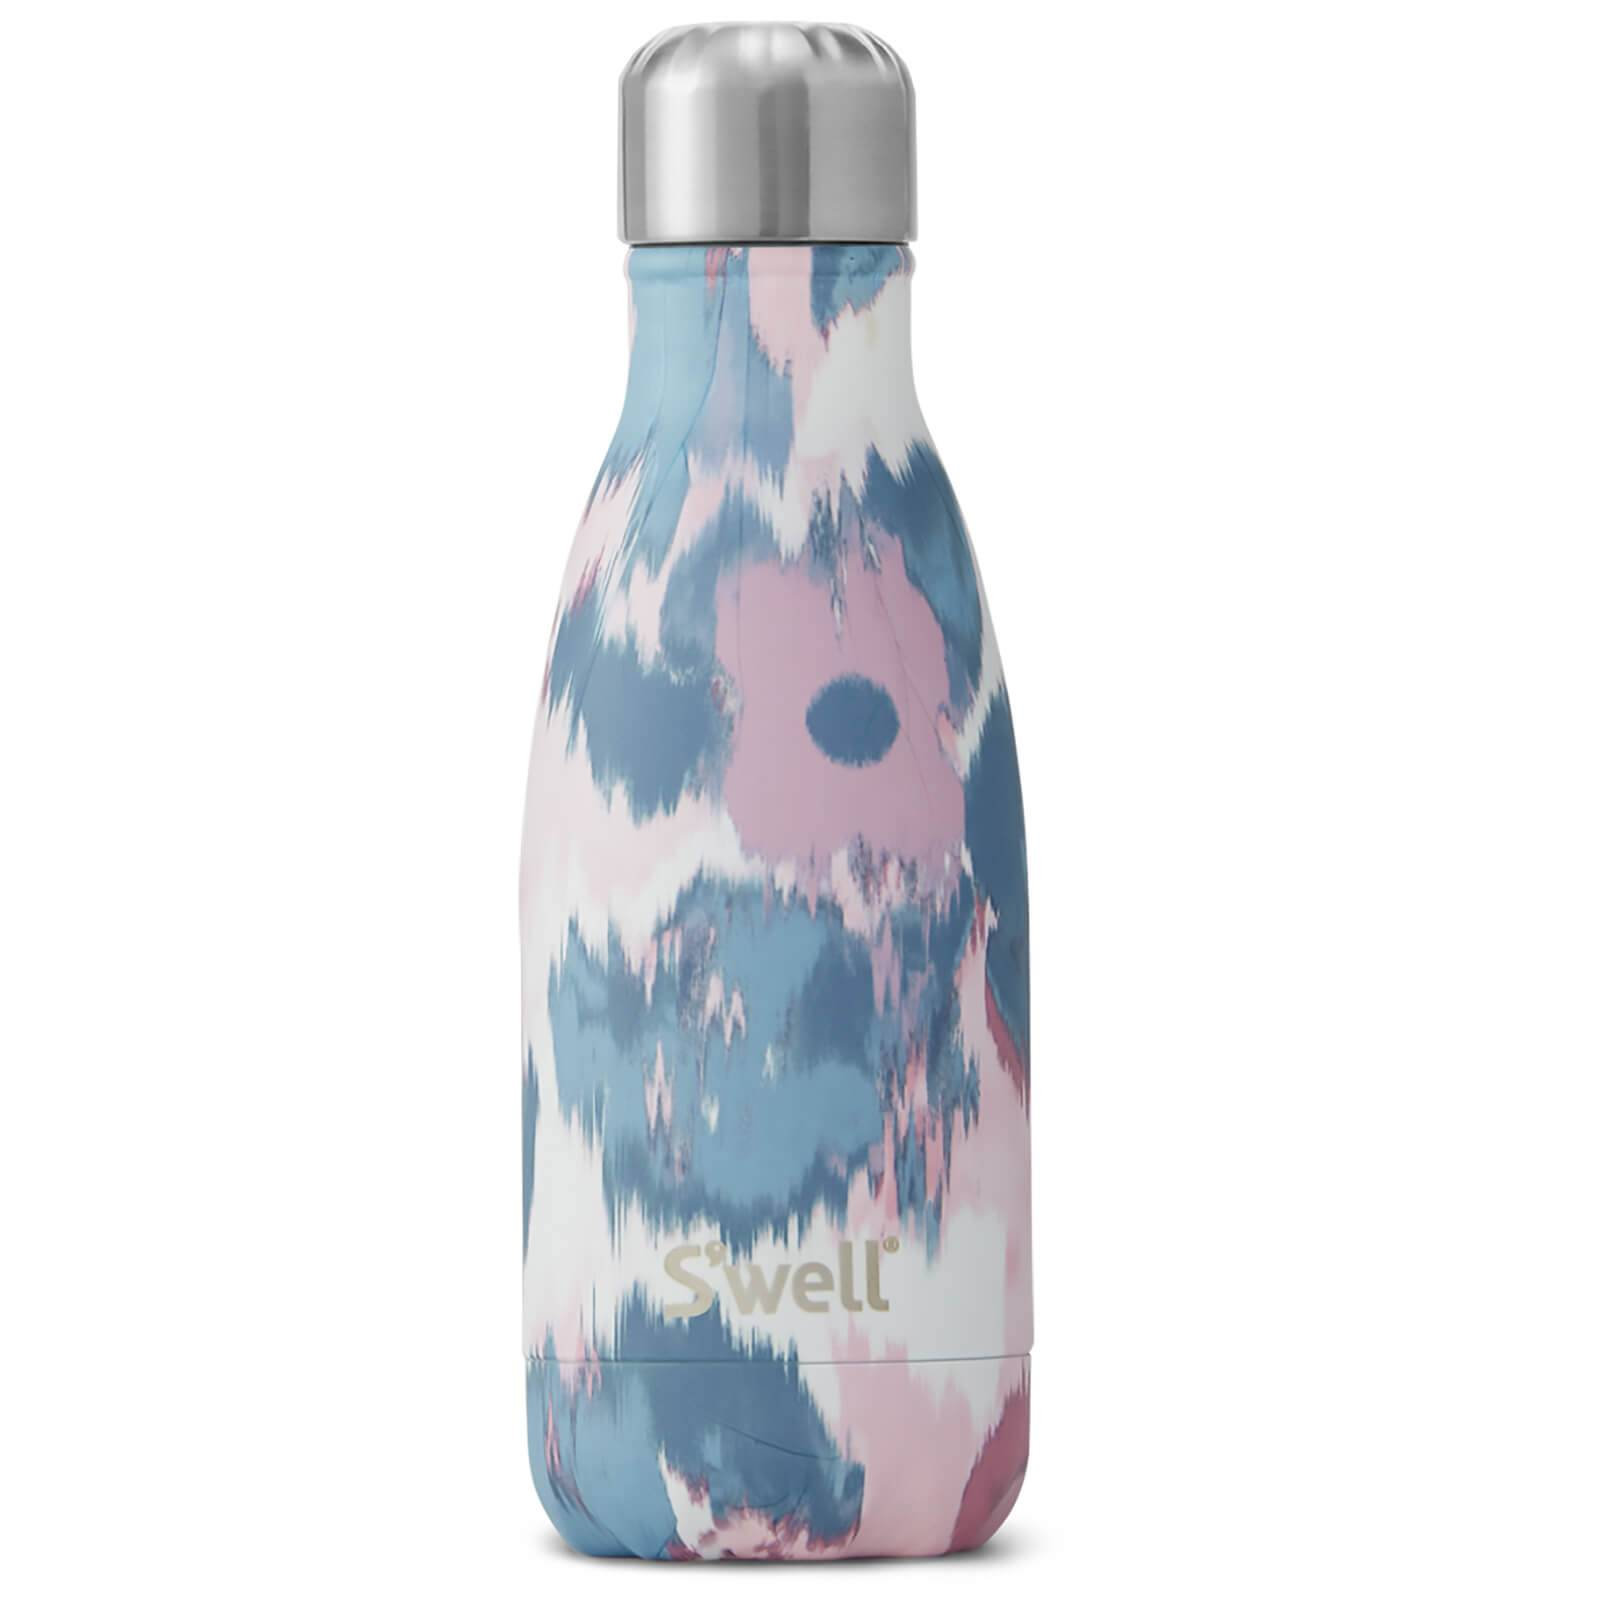 S'well Painted Poppy Water Bottle 260ml